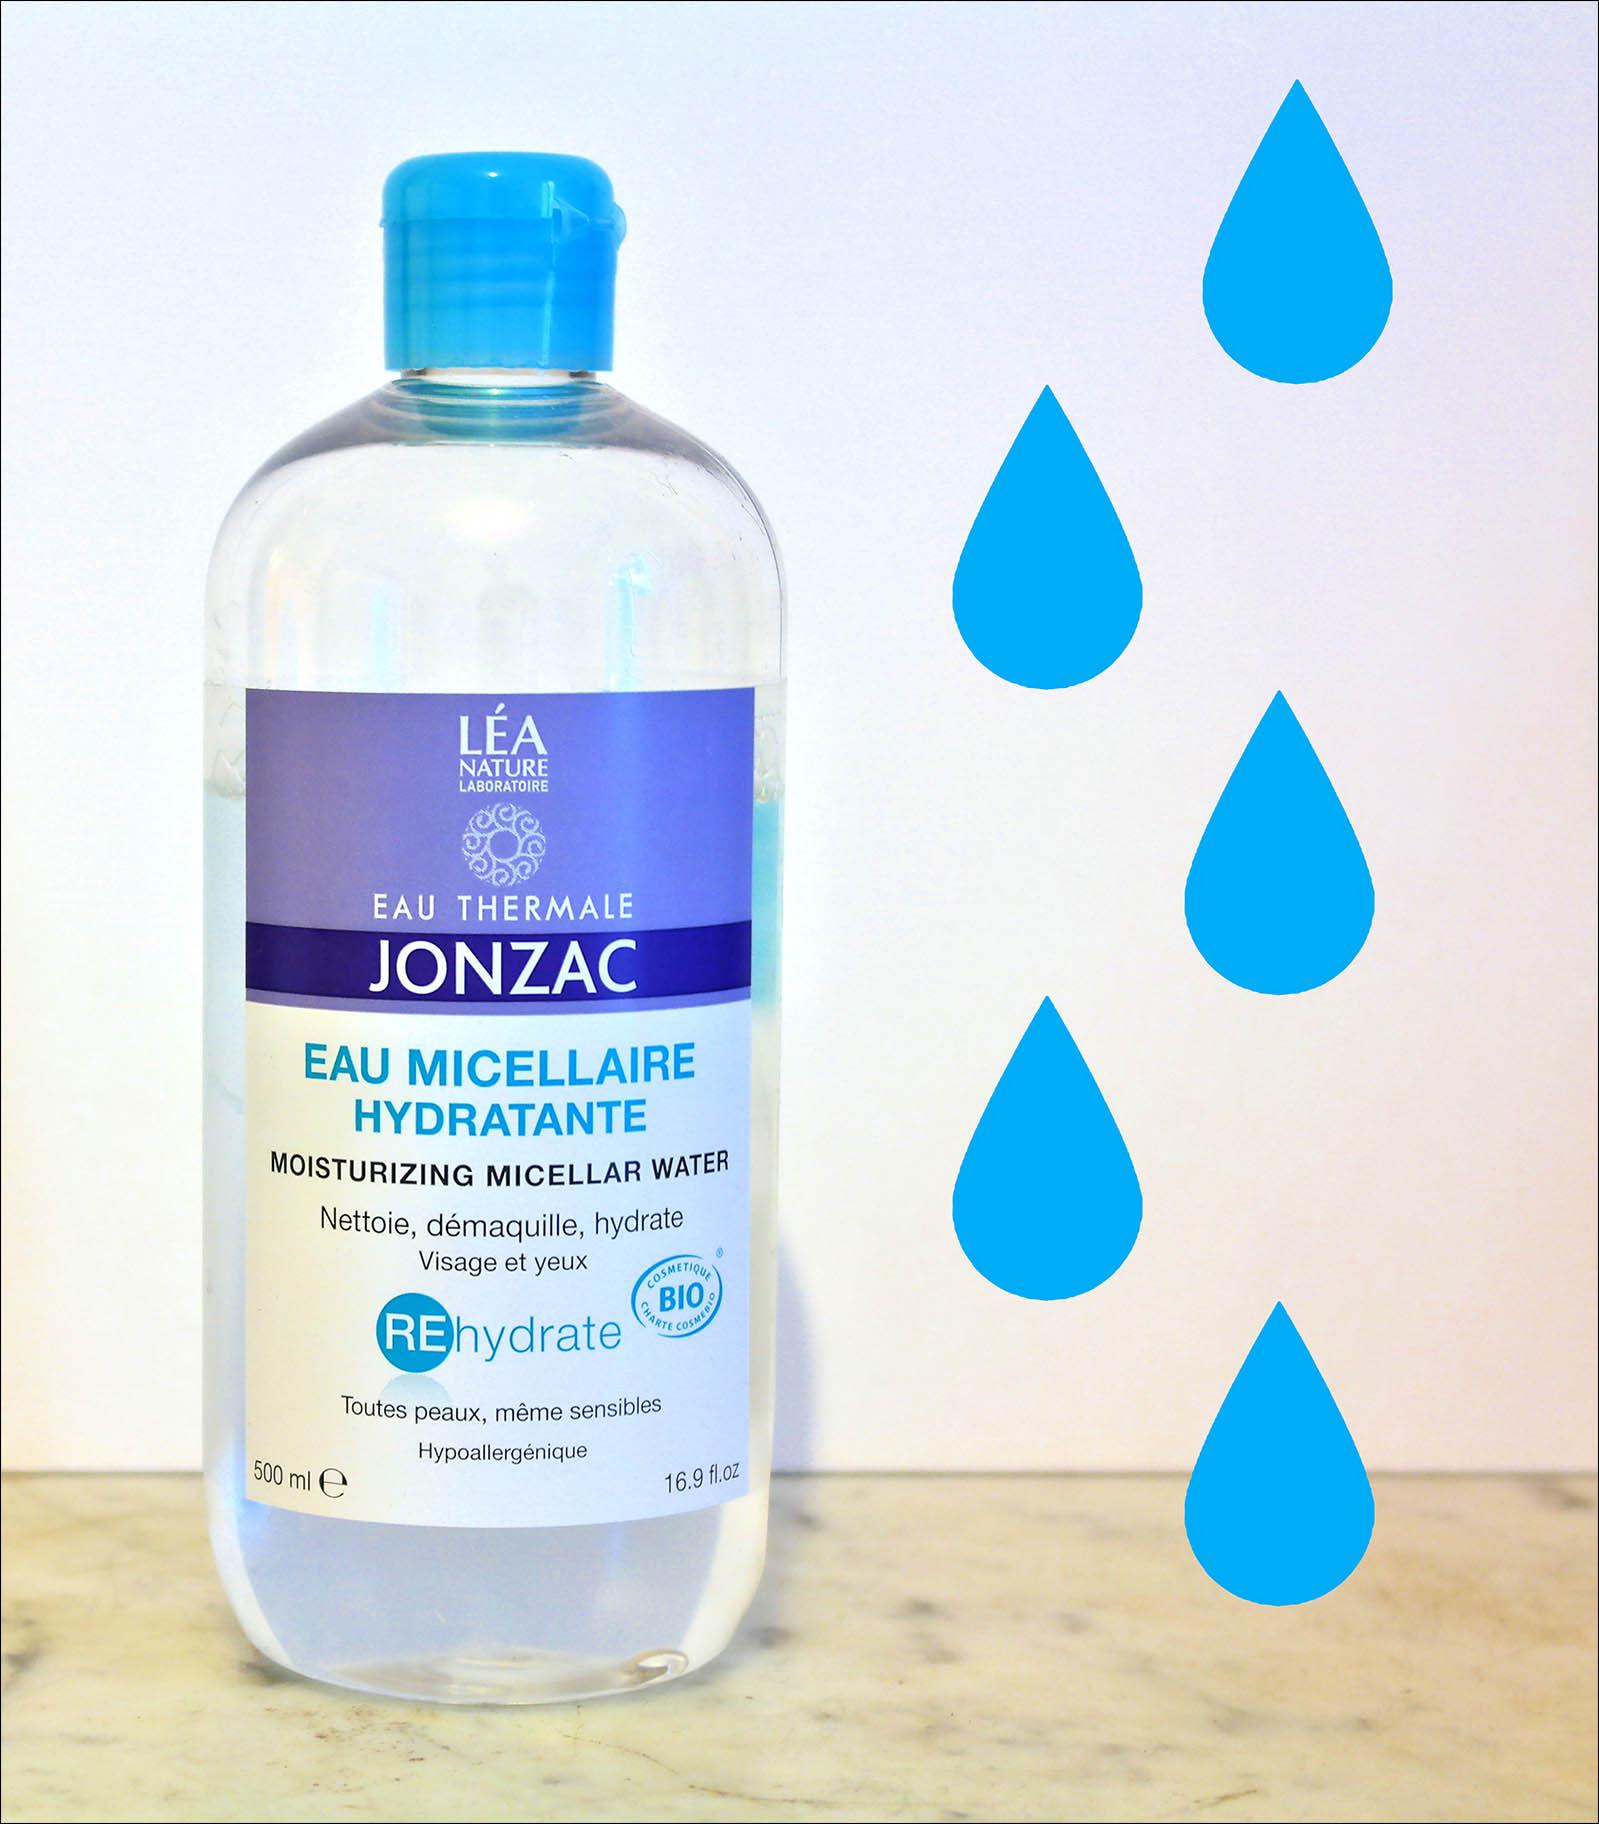 Eau micellaire hydratante Jonzac